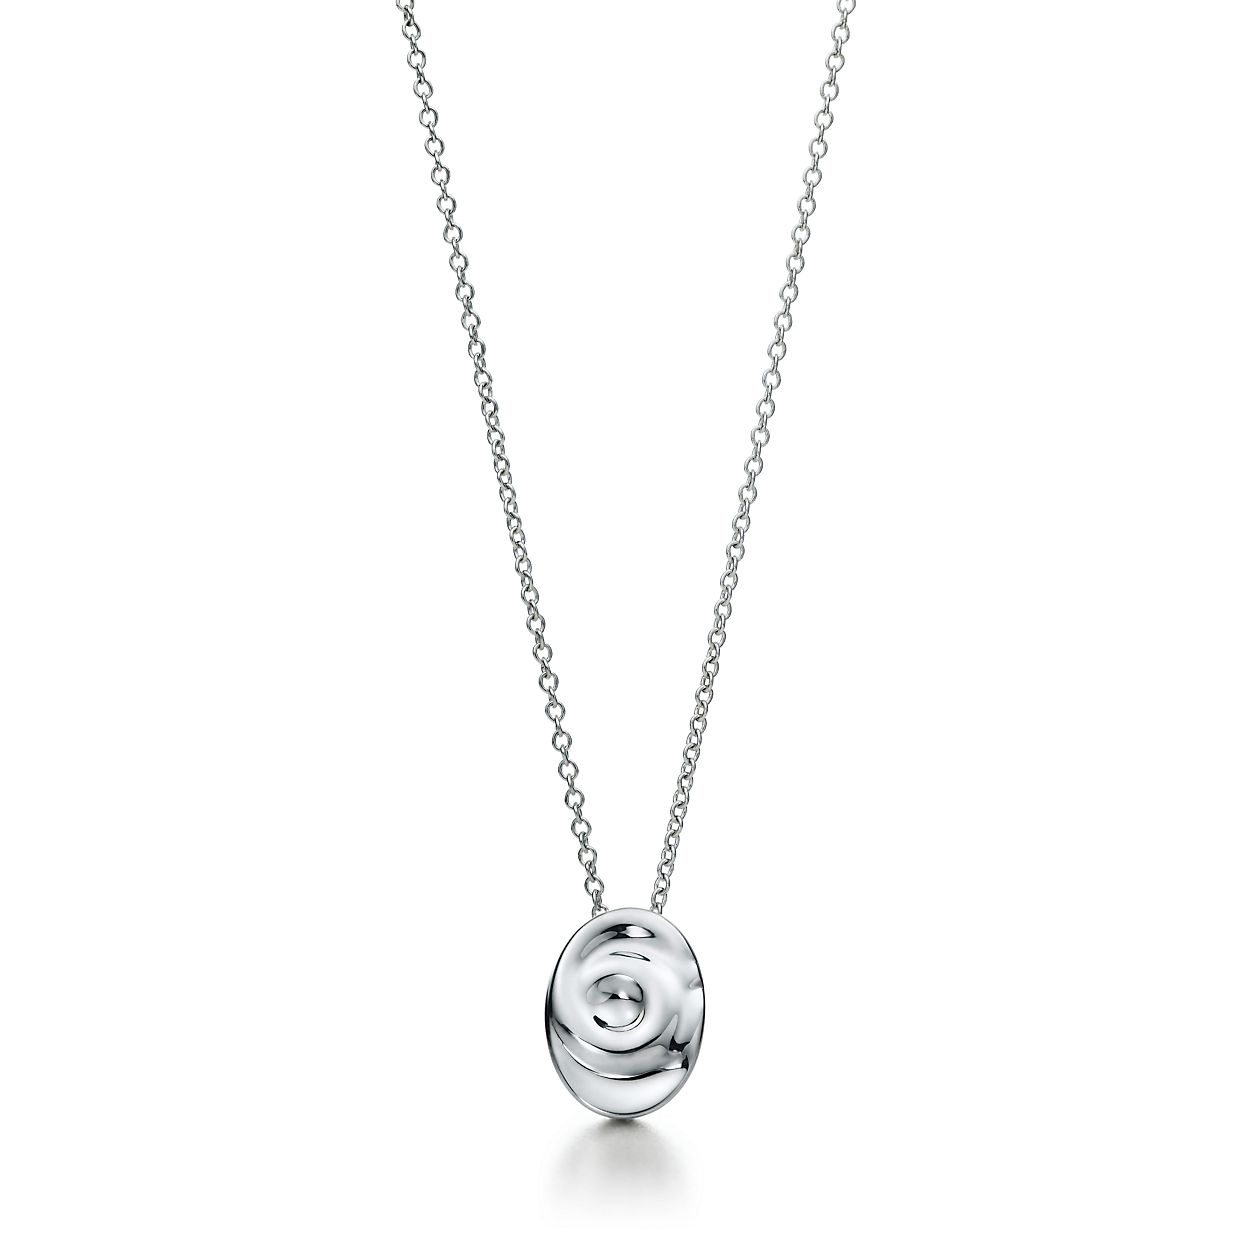 Elsa peretti zodiac pendant sterling silver tiffany co elsa peretti zodiac pendant elsa peretti zodiac pendant mozeypictures Gallery